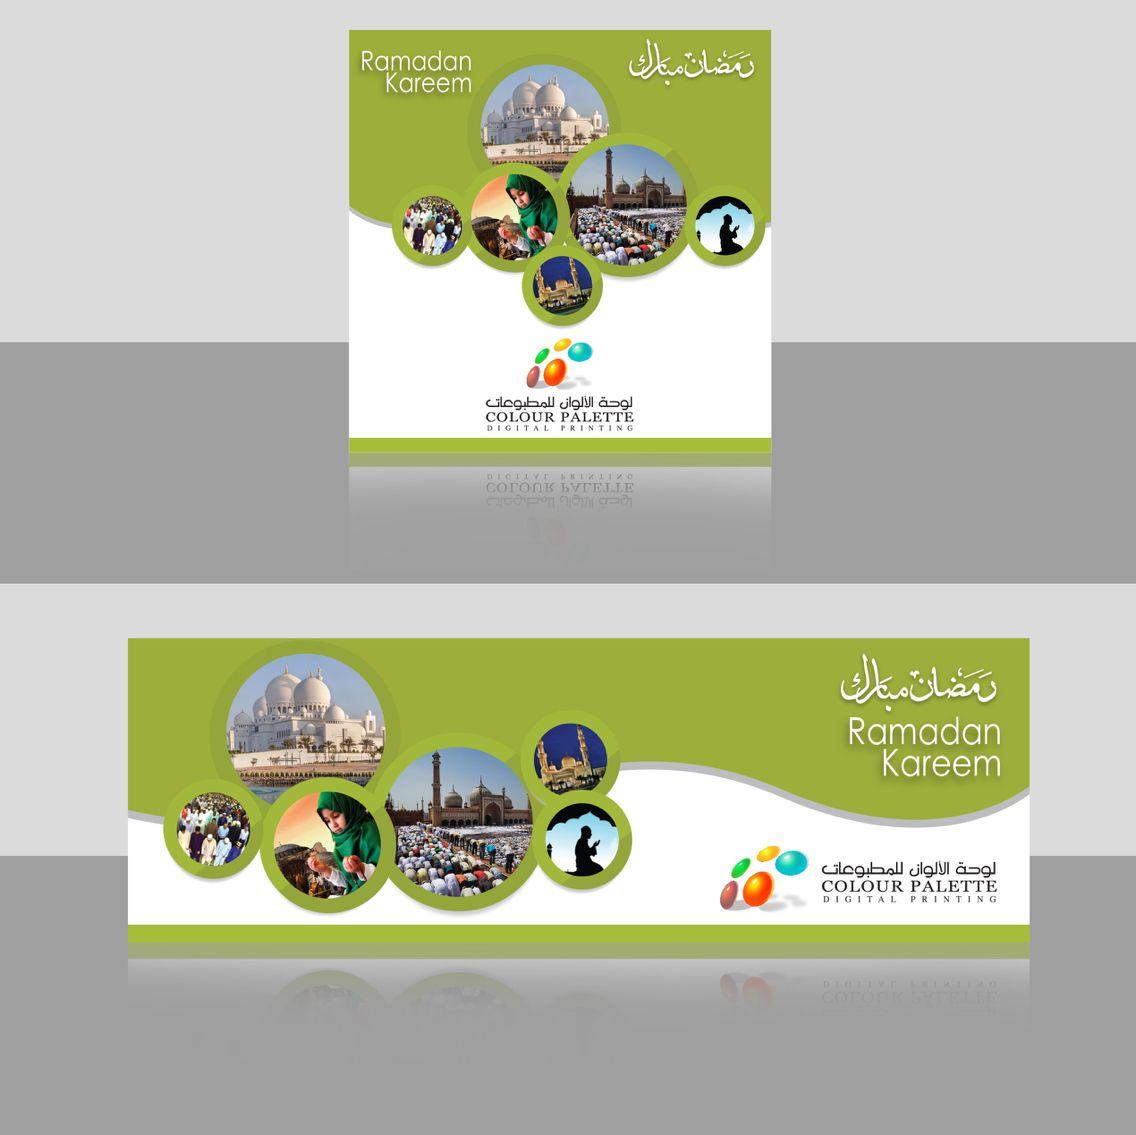 Ramadan greetings httpgreatislamicquotes ramadan quotes ramadan greetings httpgreatislamicquotes kristyandbryce Choice Image